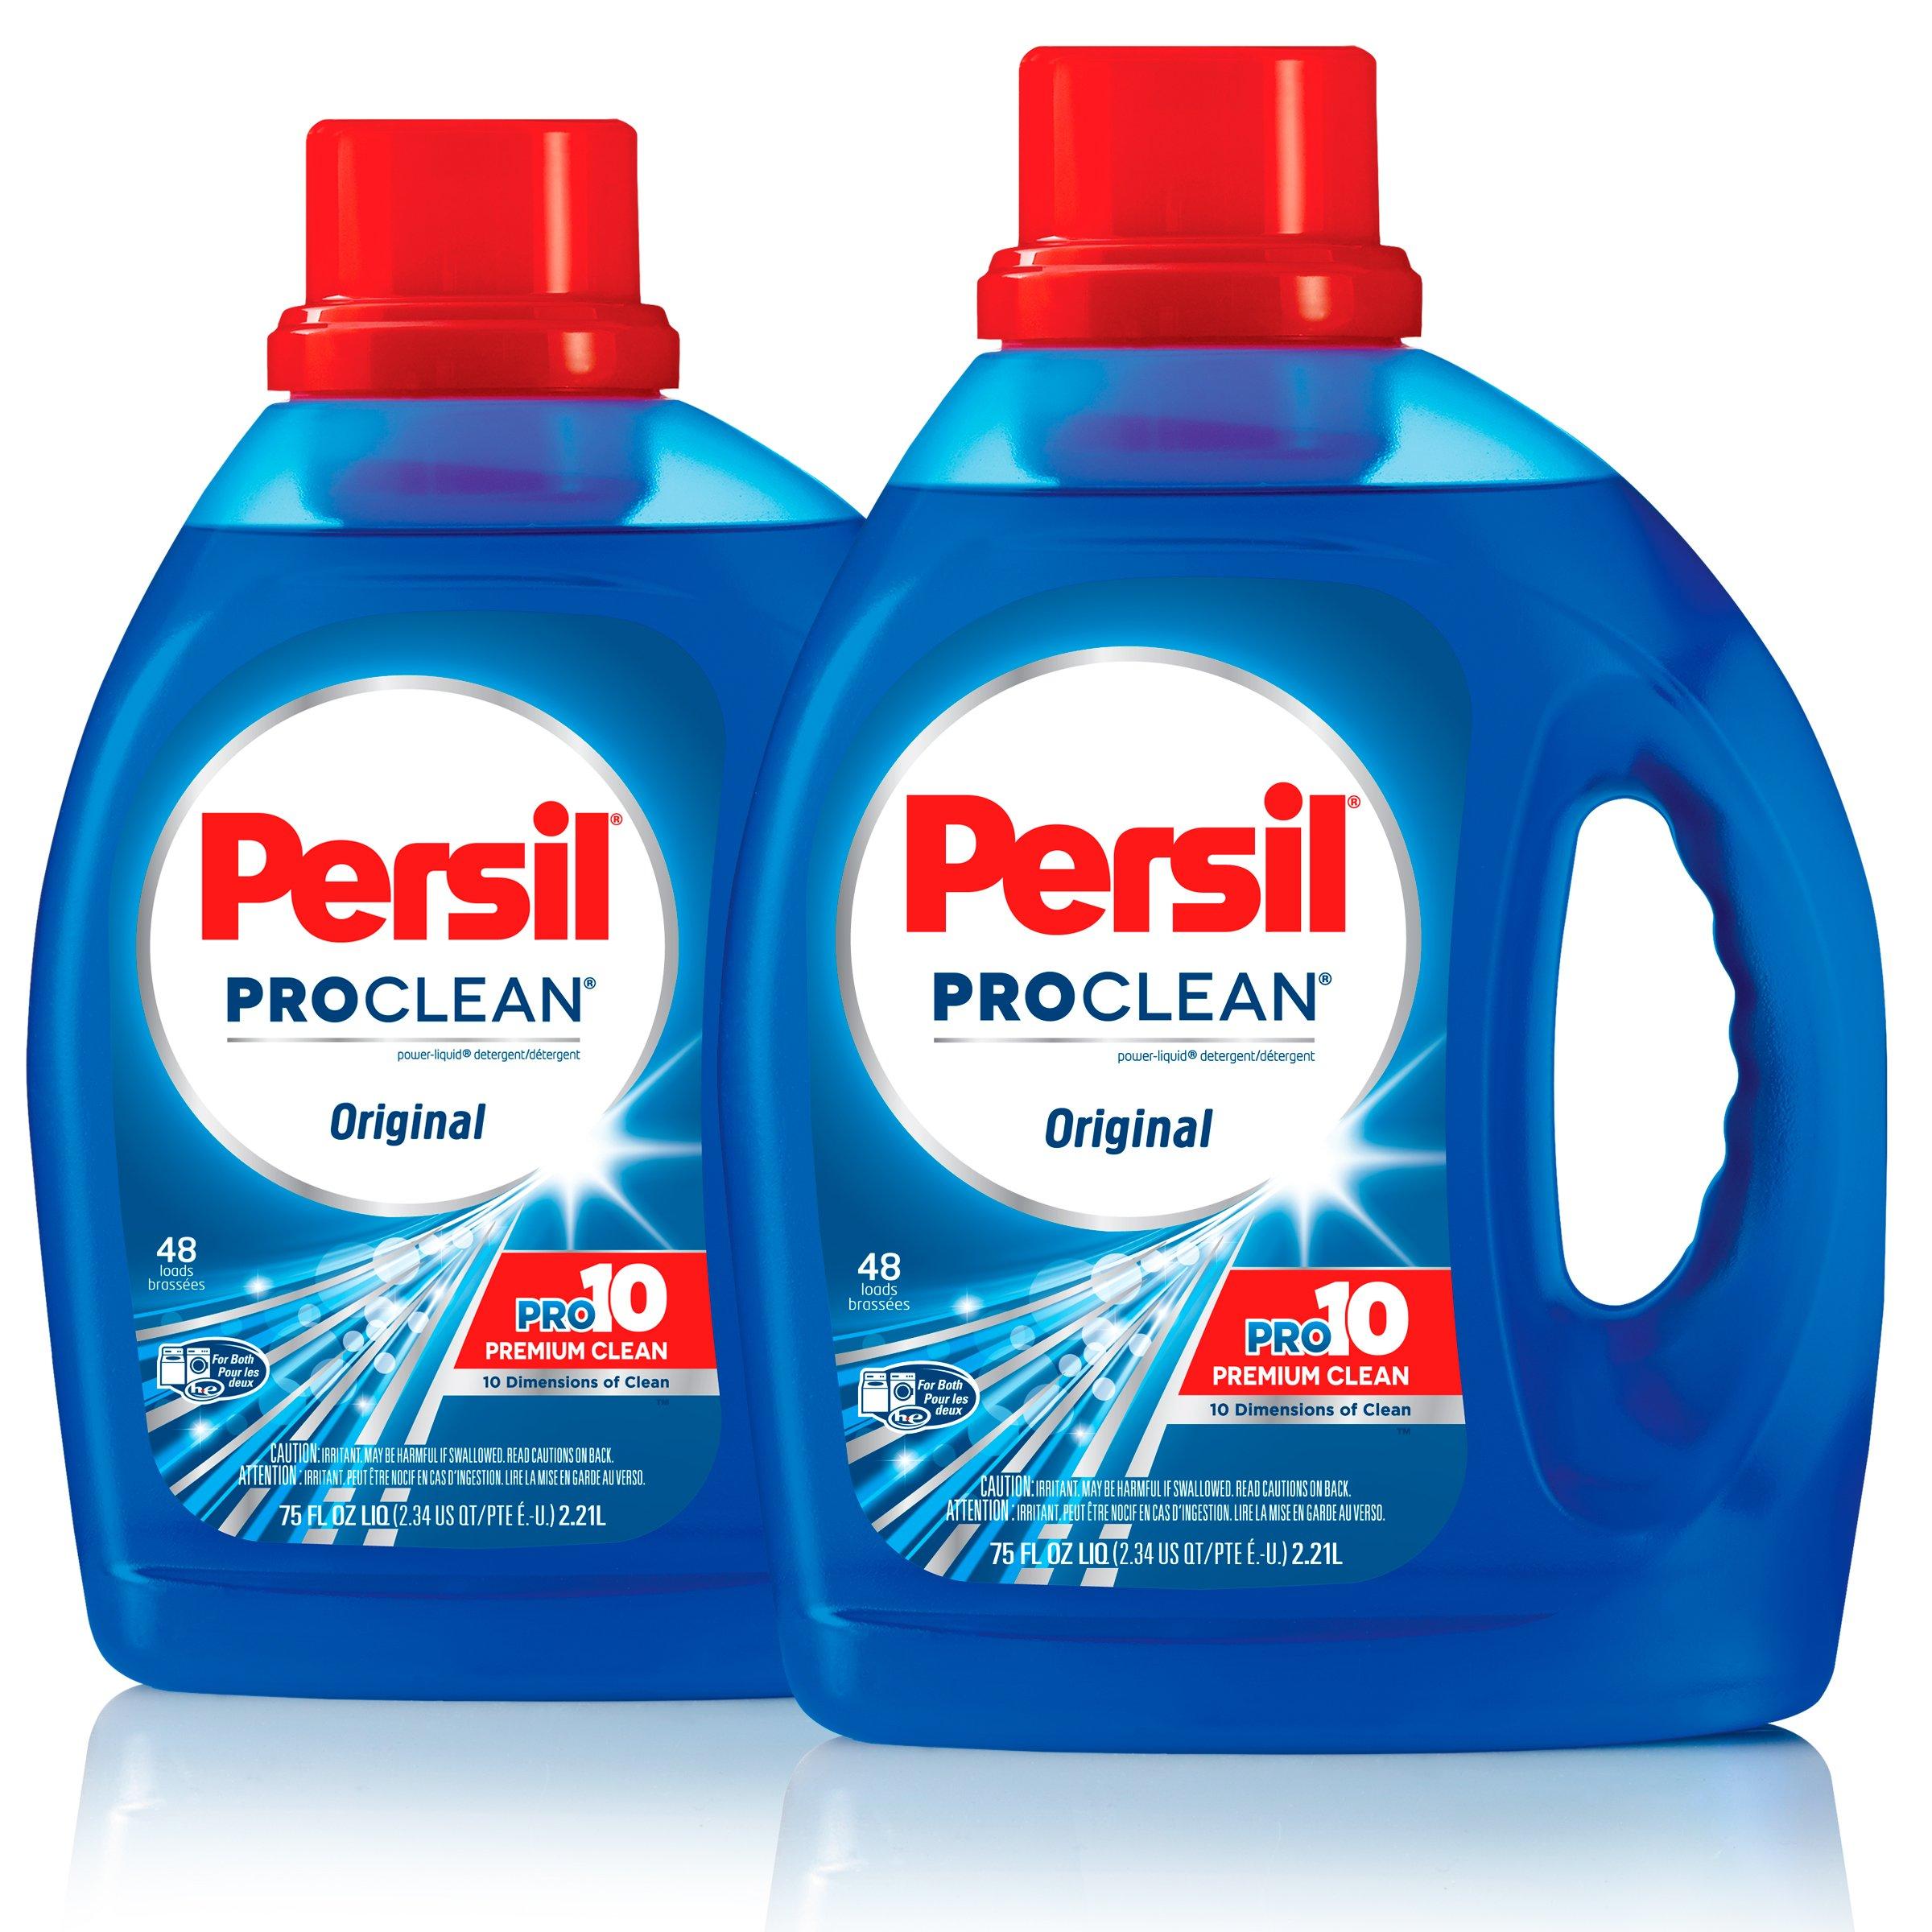 Persil ProClean Power-Liquid Laundry Detergent, Original Scent, 75 Fluid Ounces, 96 Total Loads (Pack of 2)